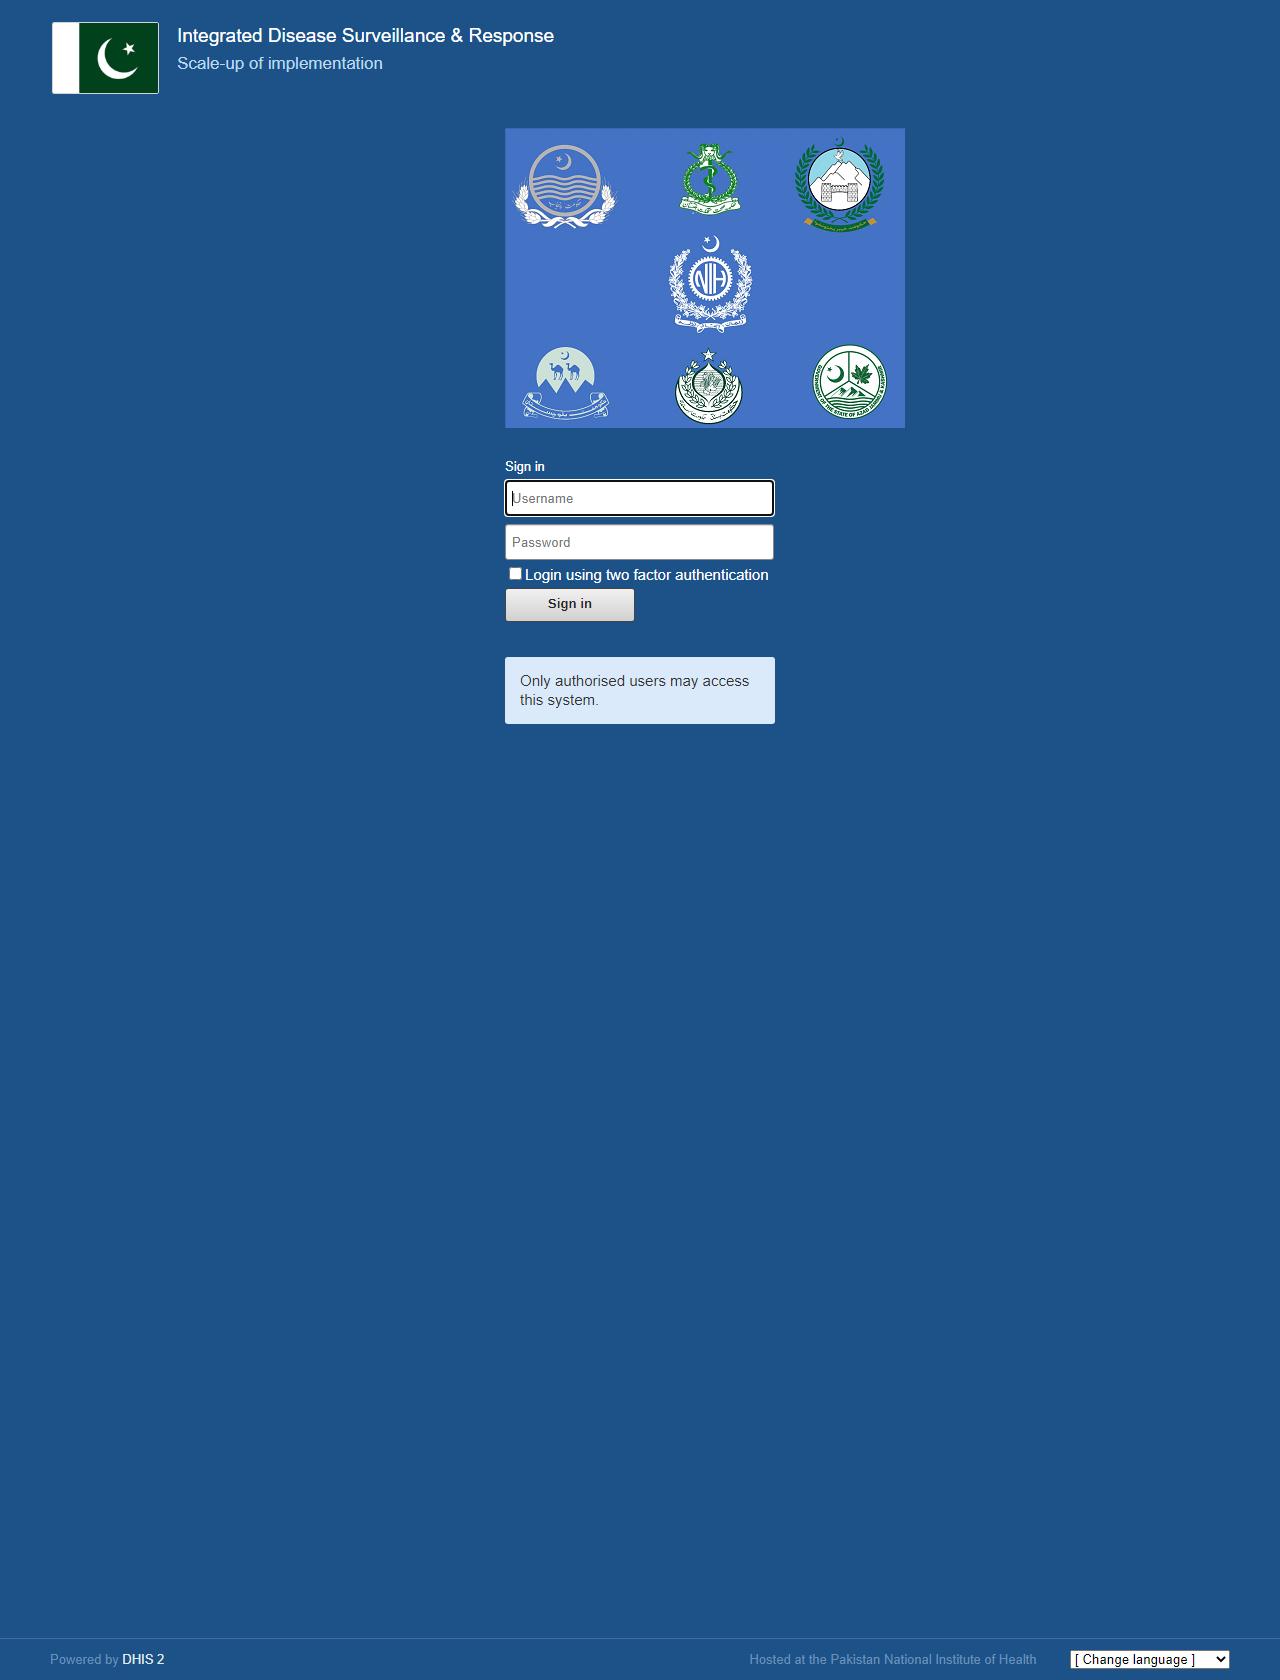 Screenshot Desktop - https://dhis2.nih.org.pk/dhis-web-commons/security/login.action